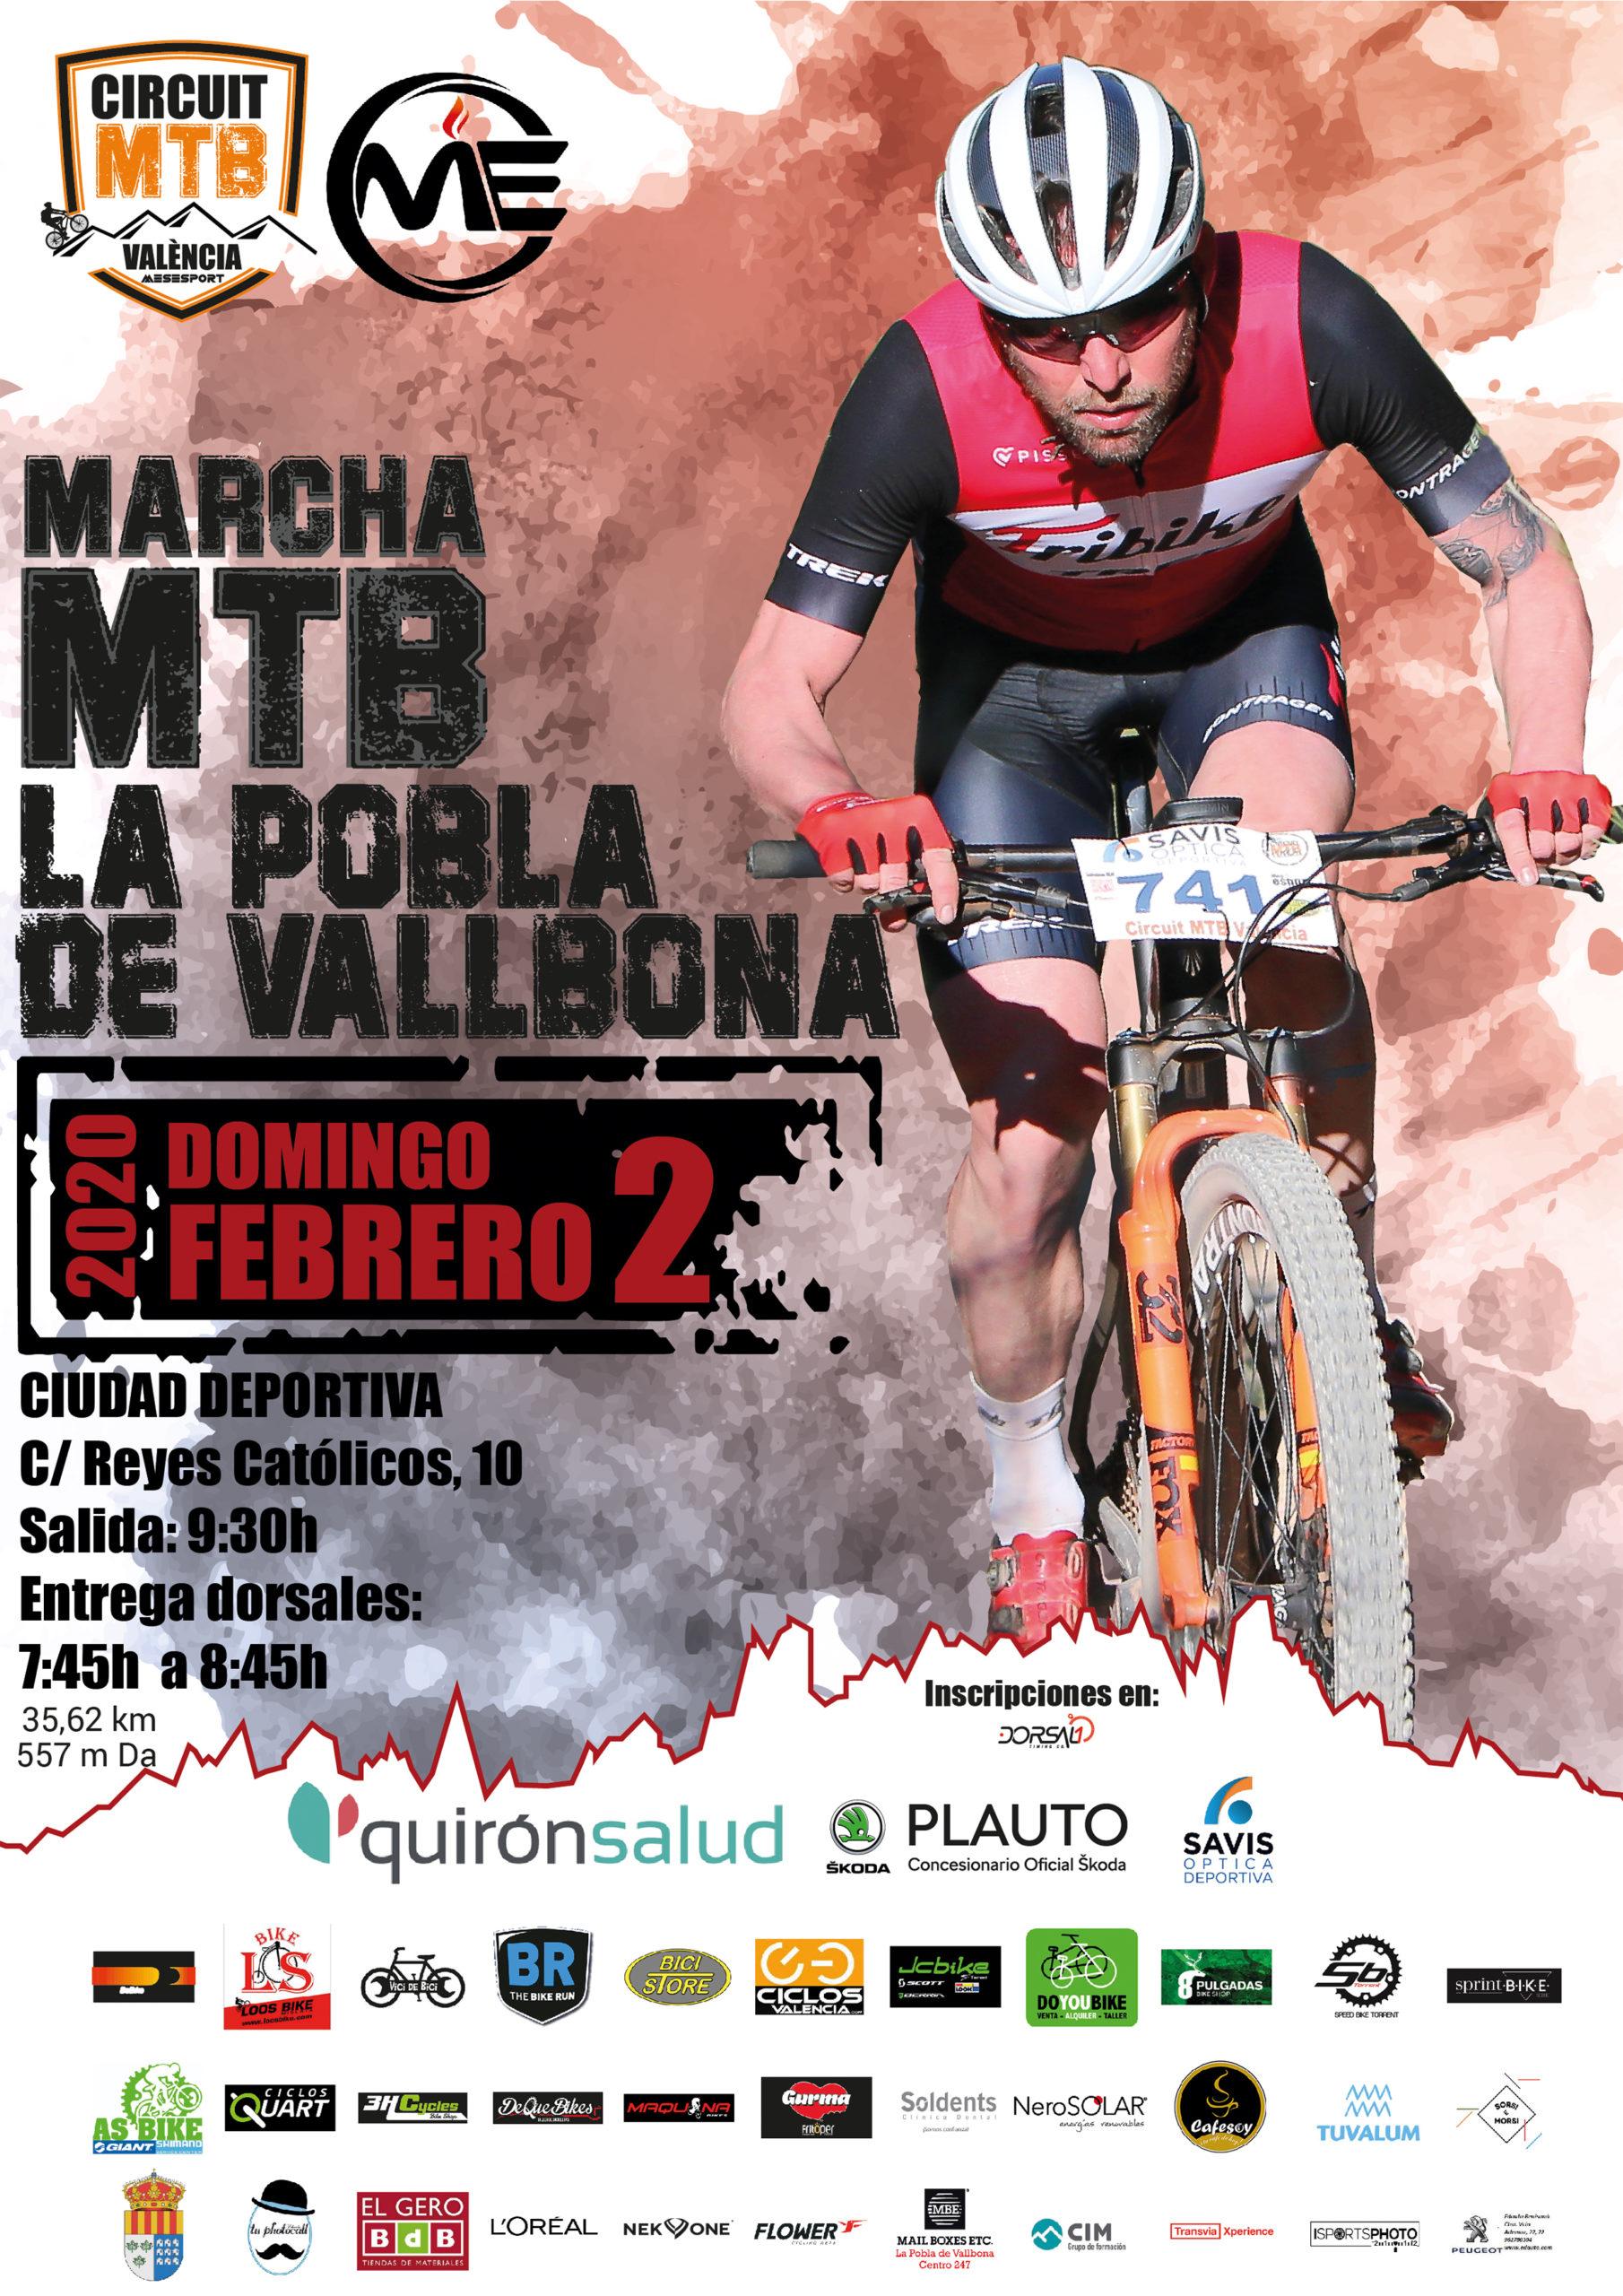 Marcha BTT, Marcha MTB, Marcha La pobla de Vallbona, Circuit mtb Valencia, Circuito Serrania, Mountain bike,